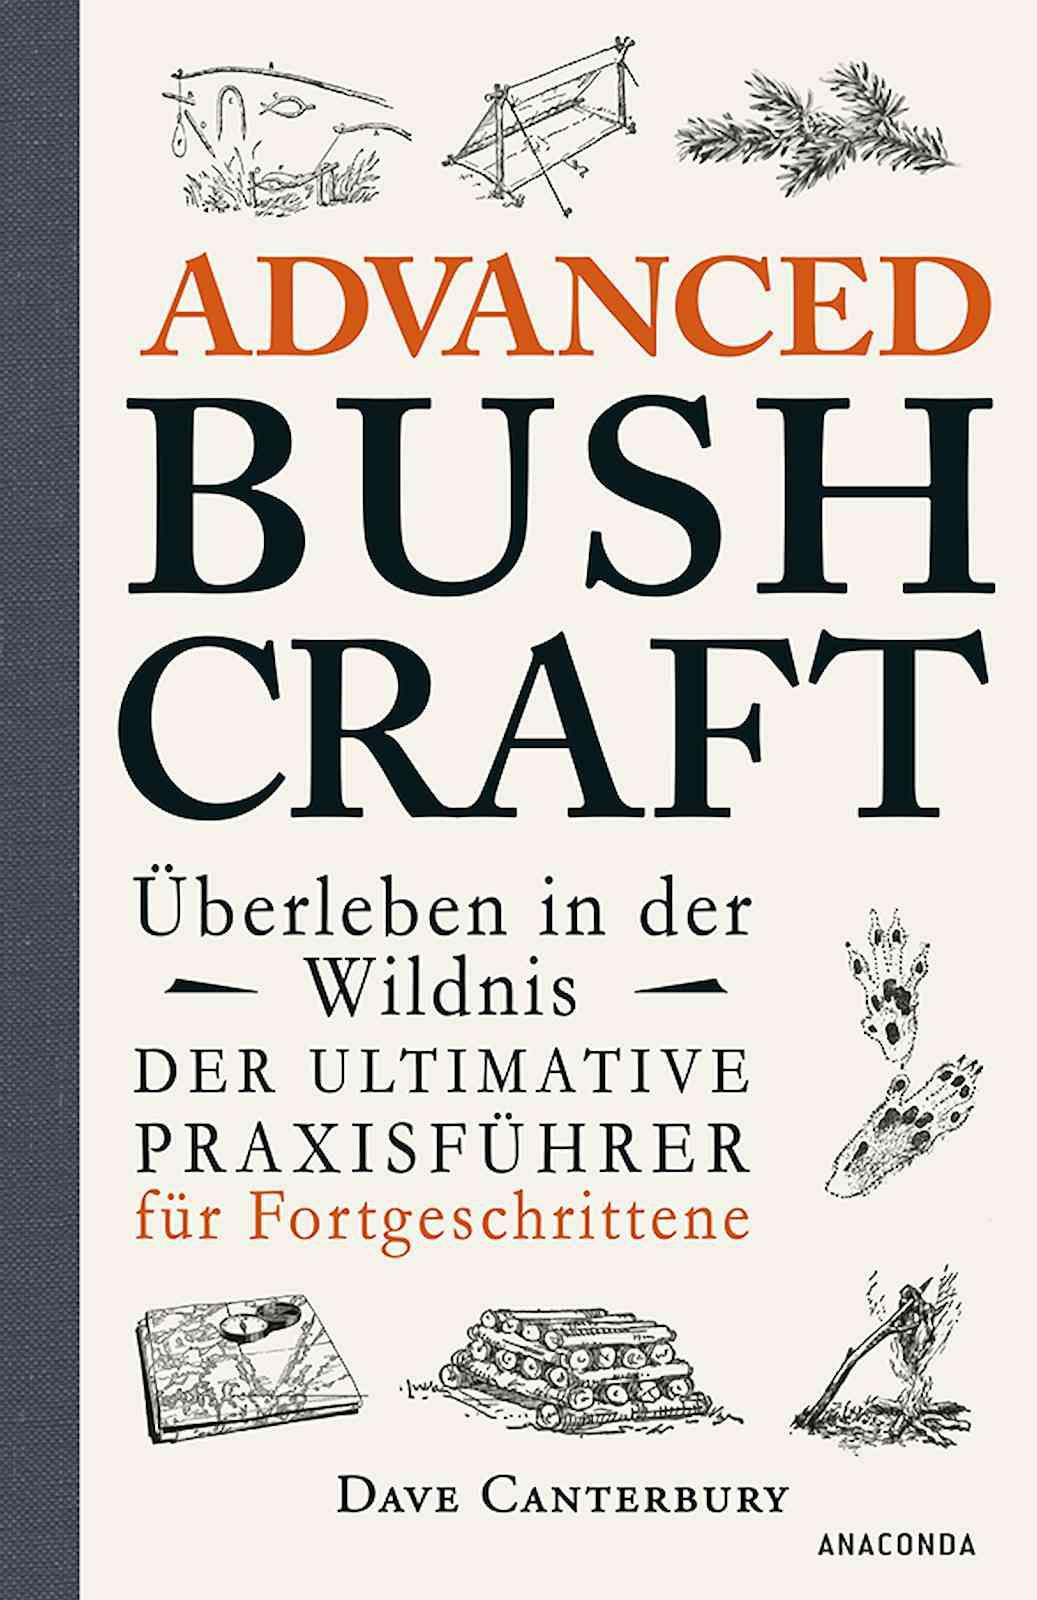 Dave Canterbury - Advanced Bushcraft